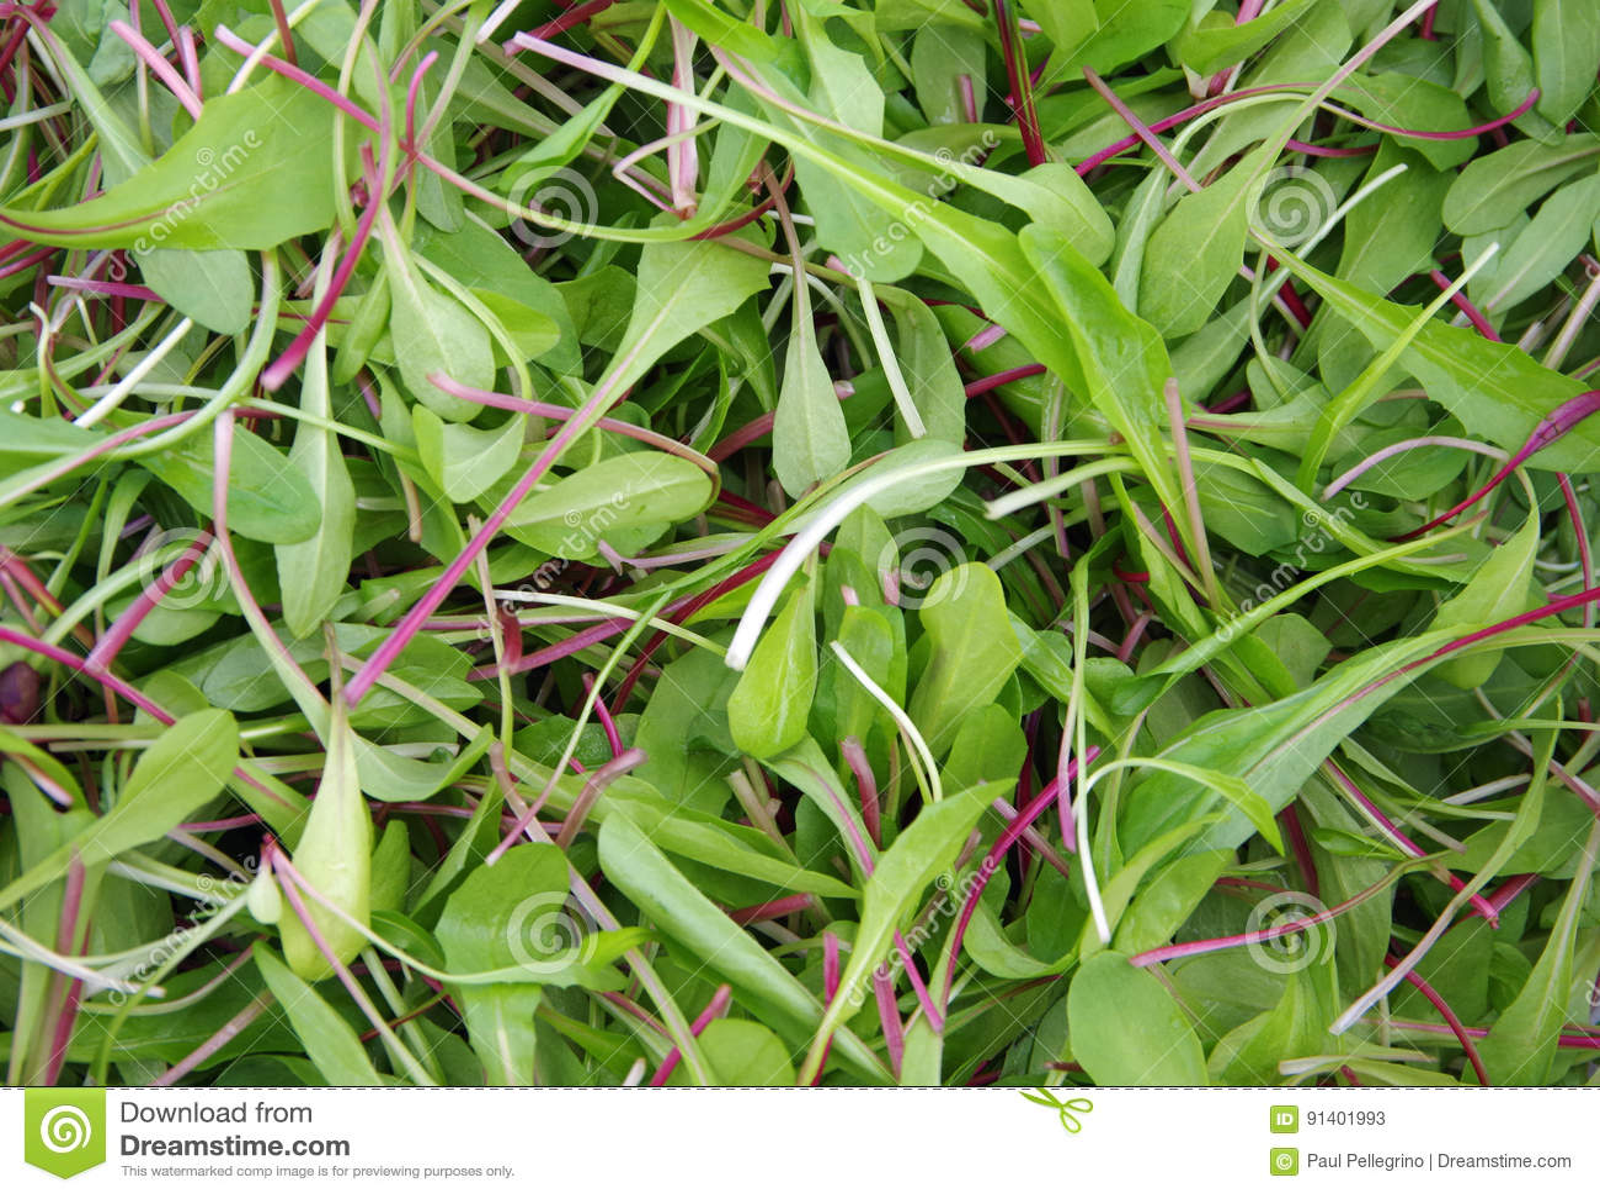 Fresh cut salad greens